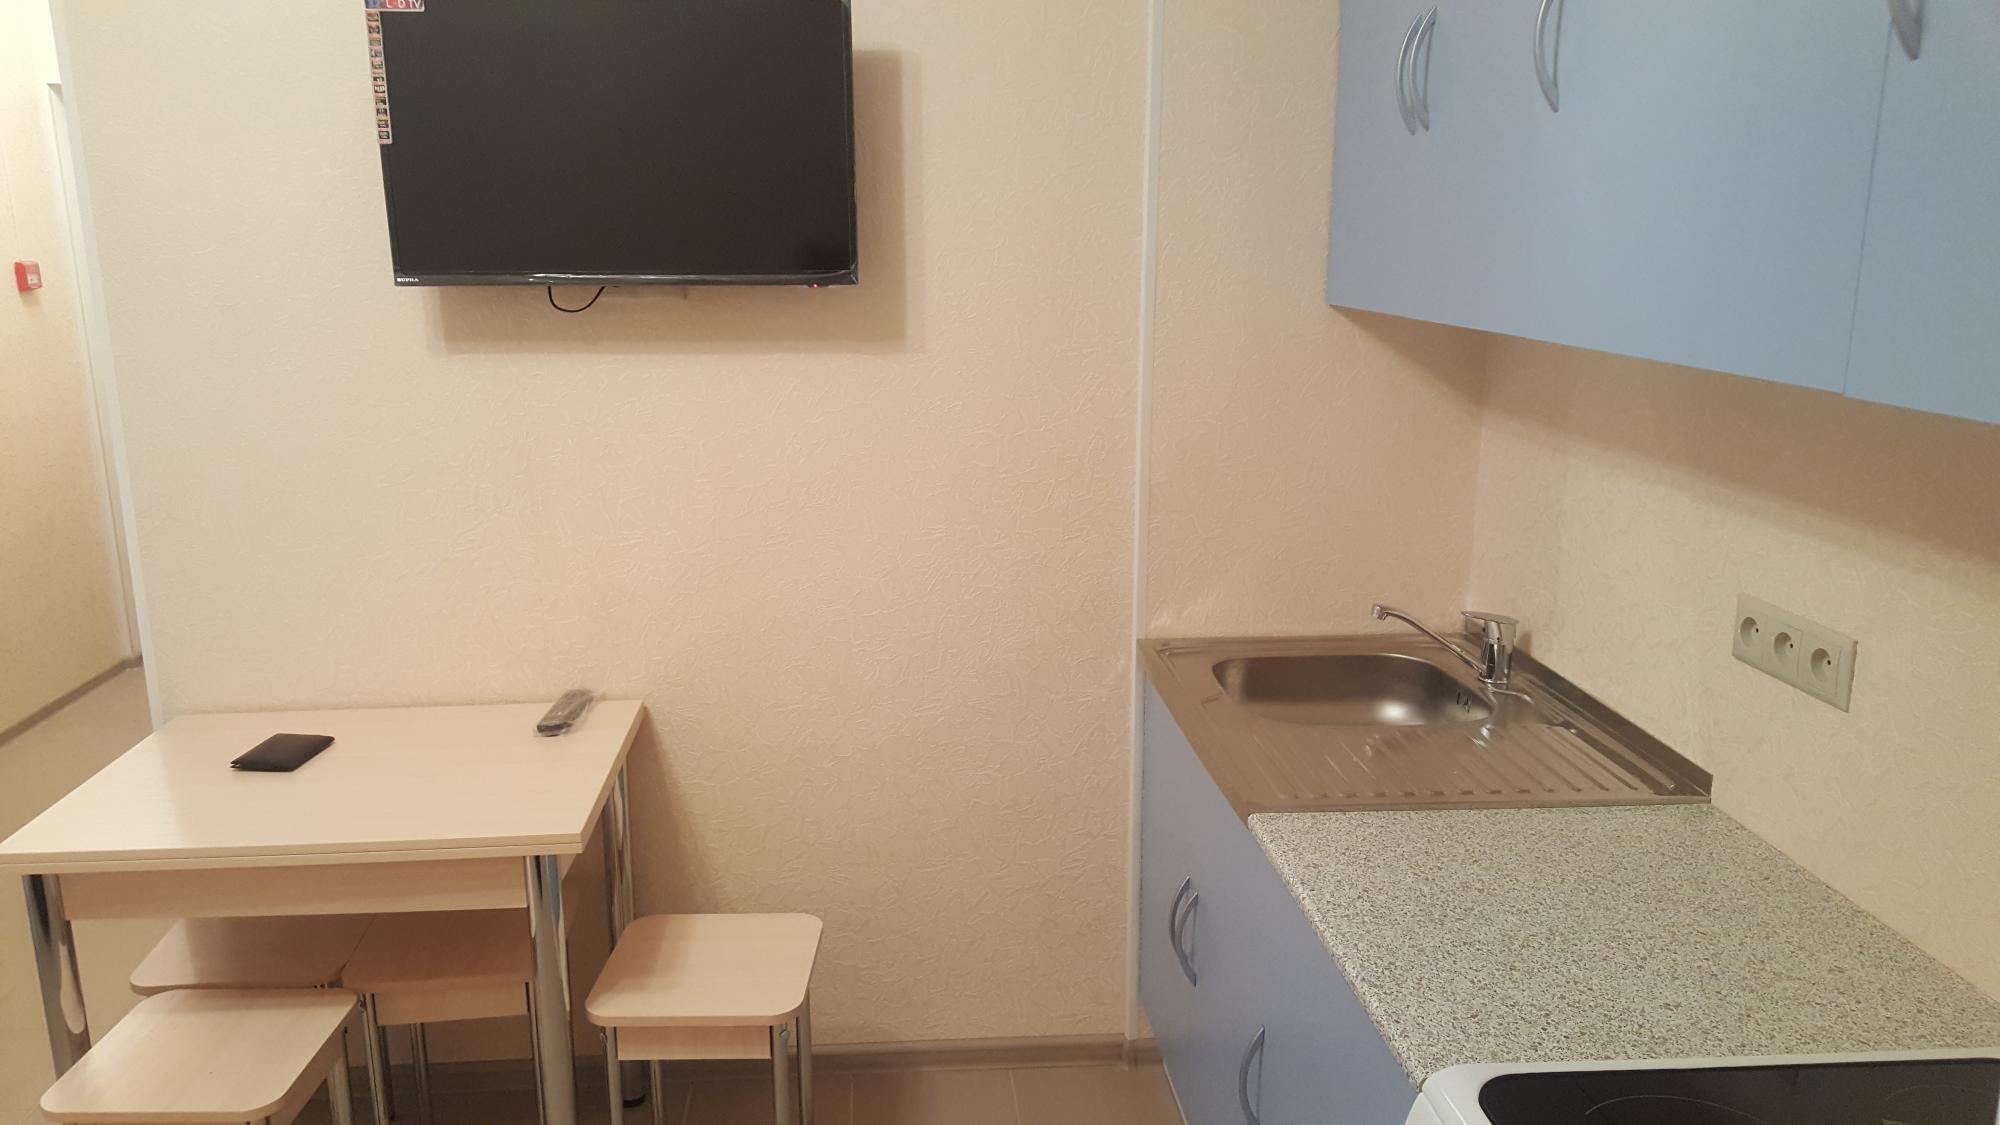 Квартира, 1 комната, 40 м² в Зеленограде 89776541696 купить 6